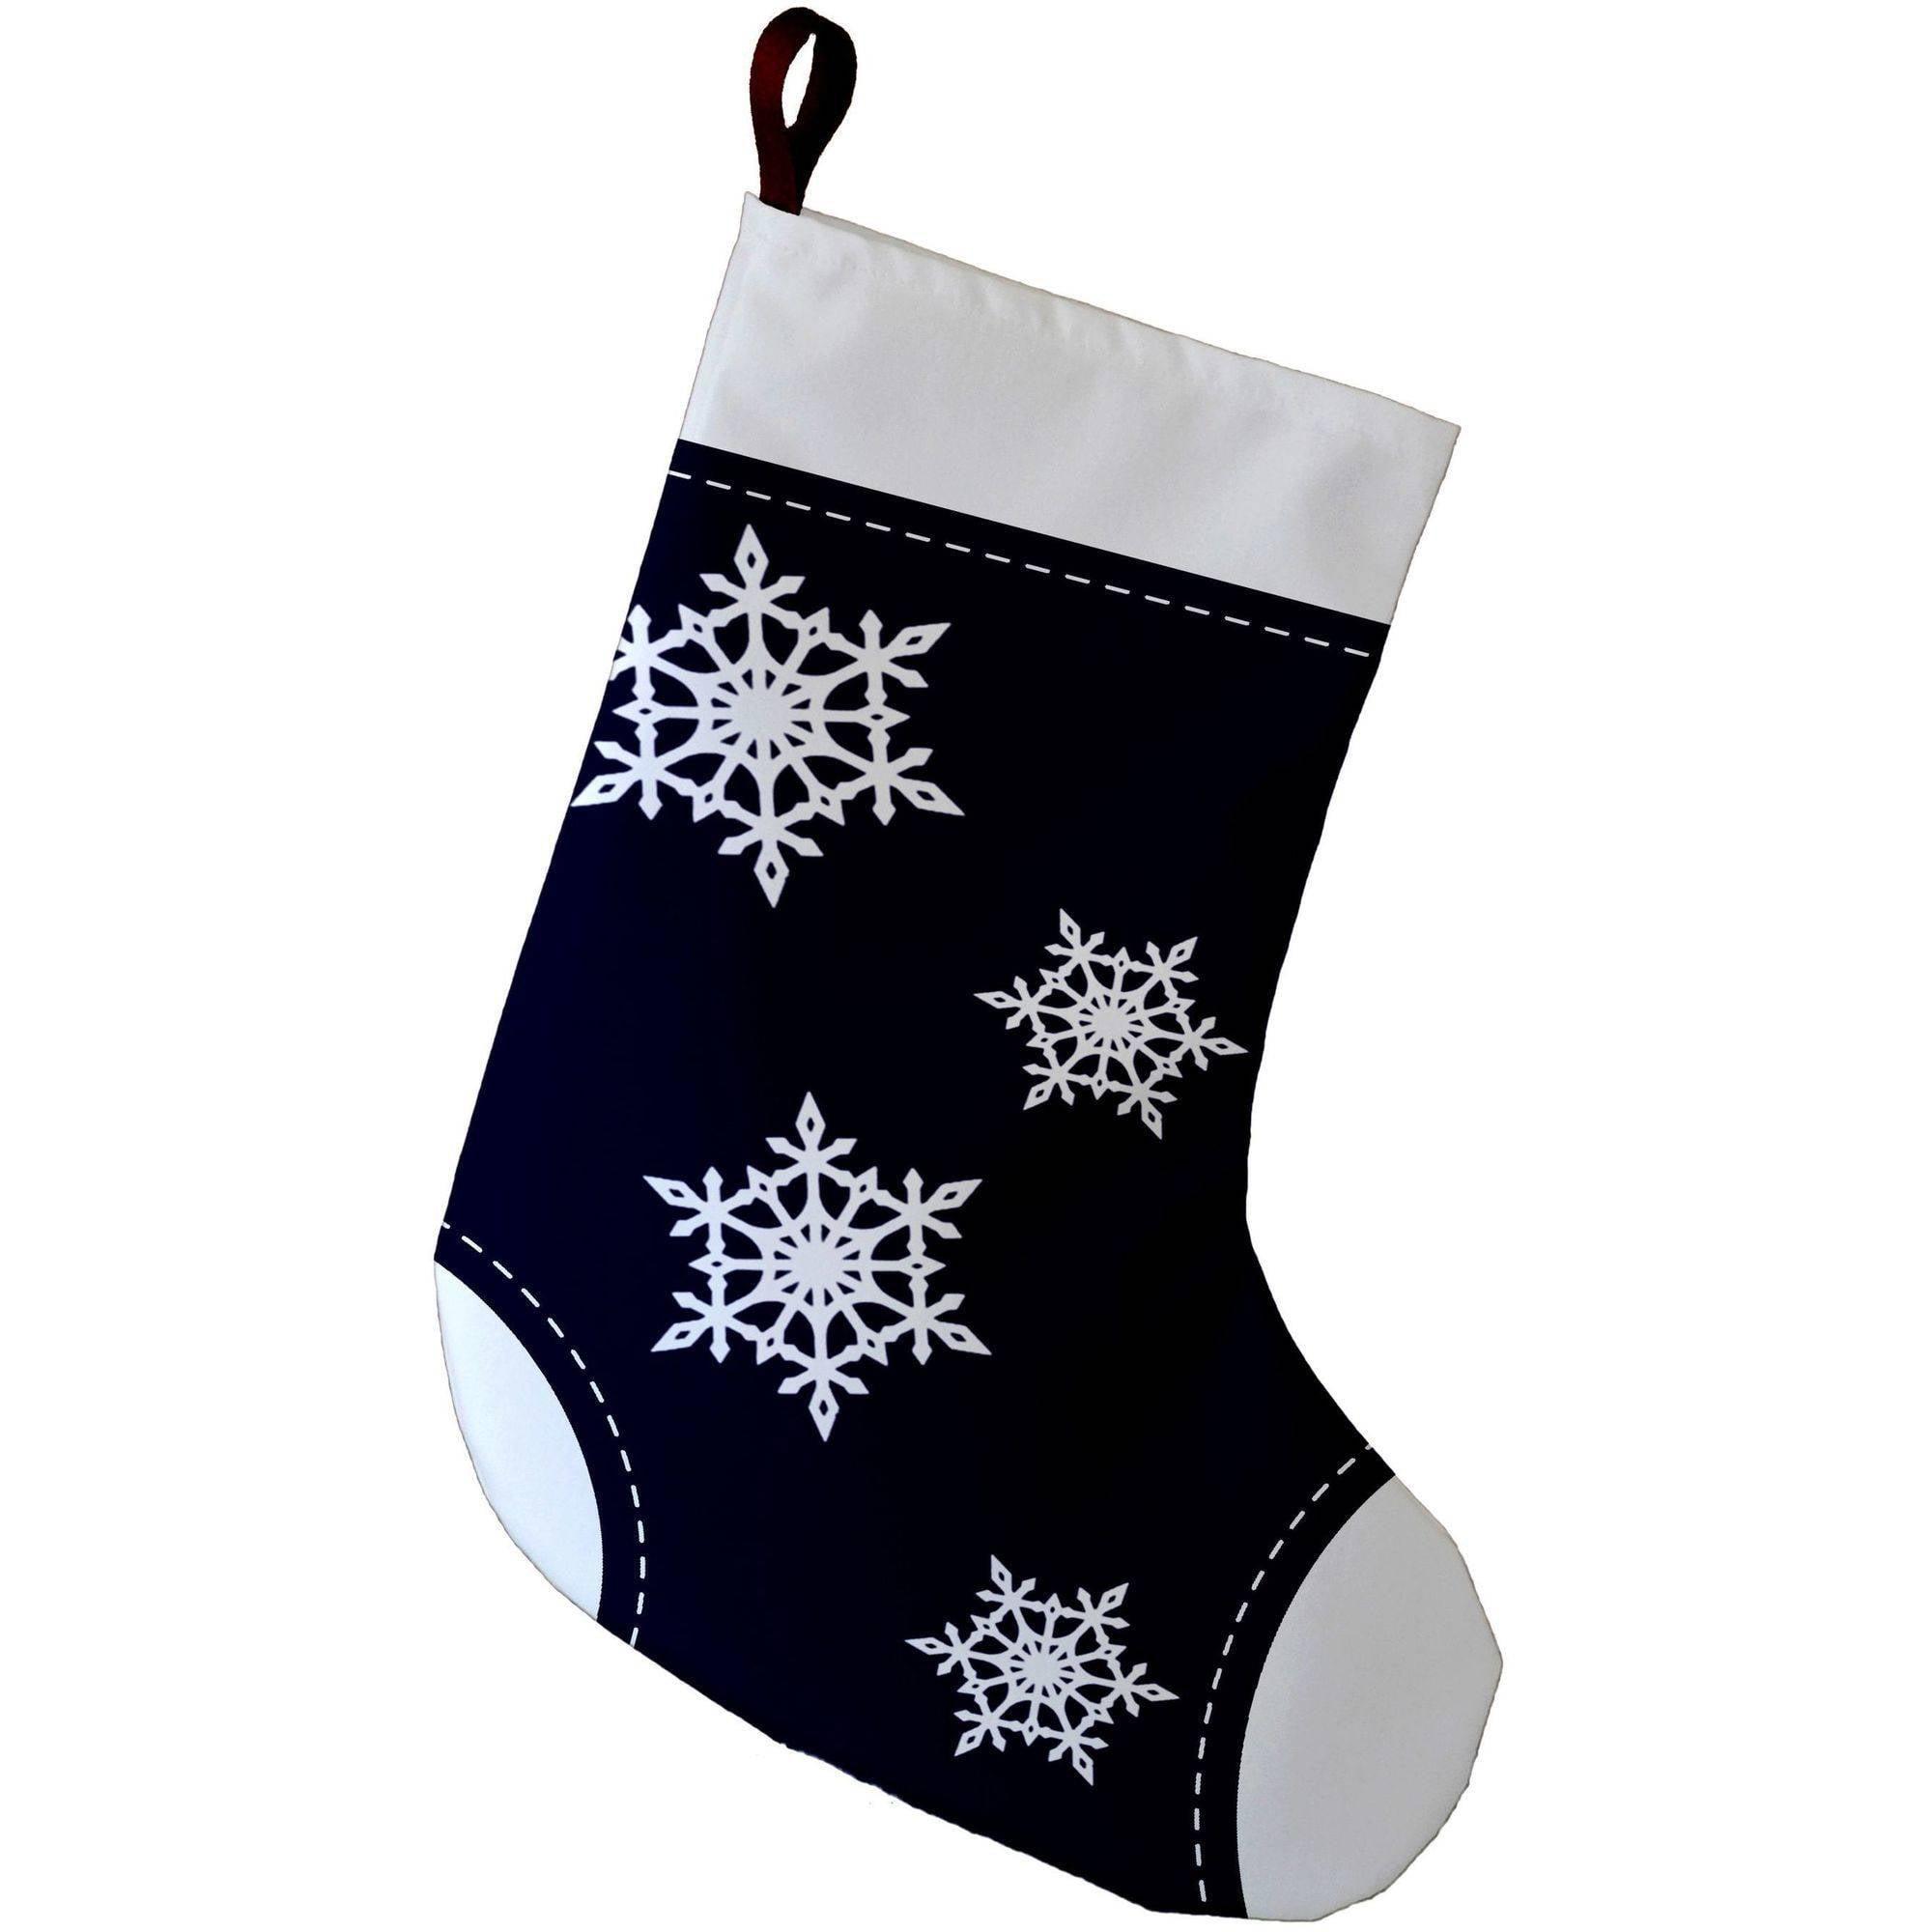 E By Design Simply Daisy, 9 x 16, Snowflake, Decorative Holiday Geometric Print Stocking